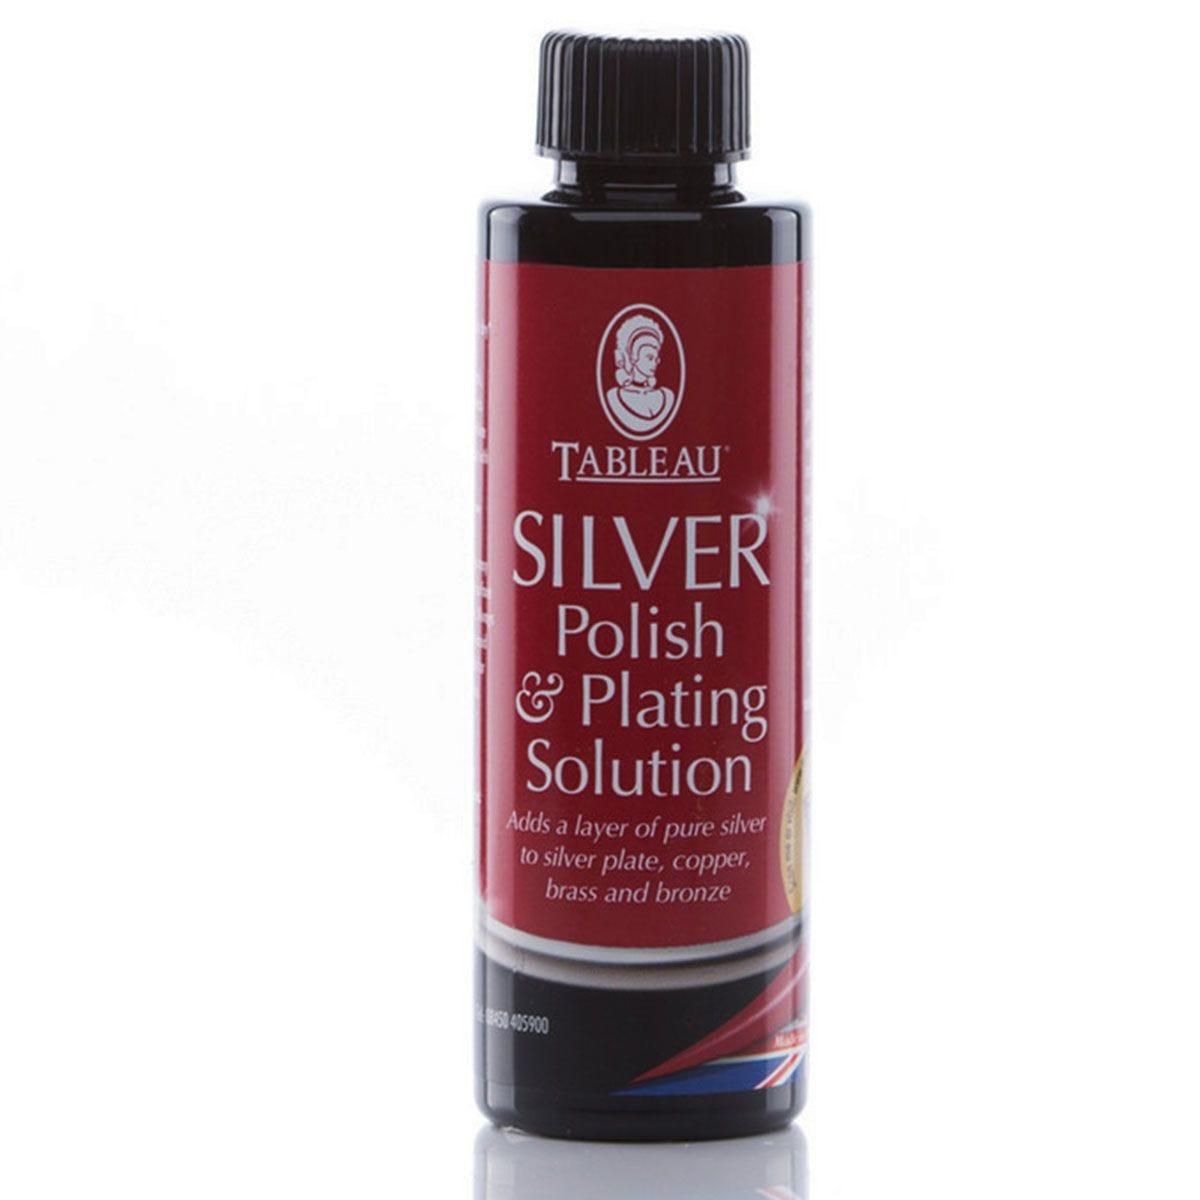 Tableau Silver Polish & Plating Solution